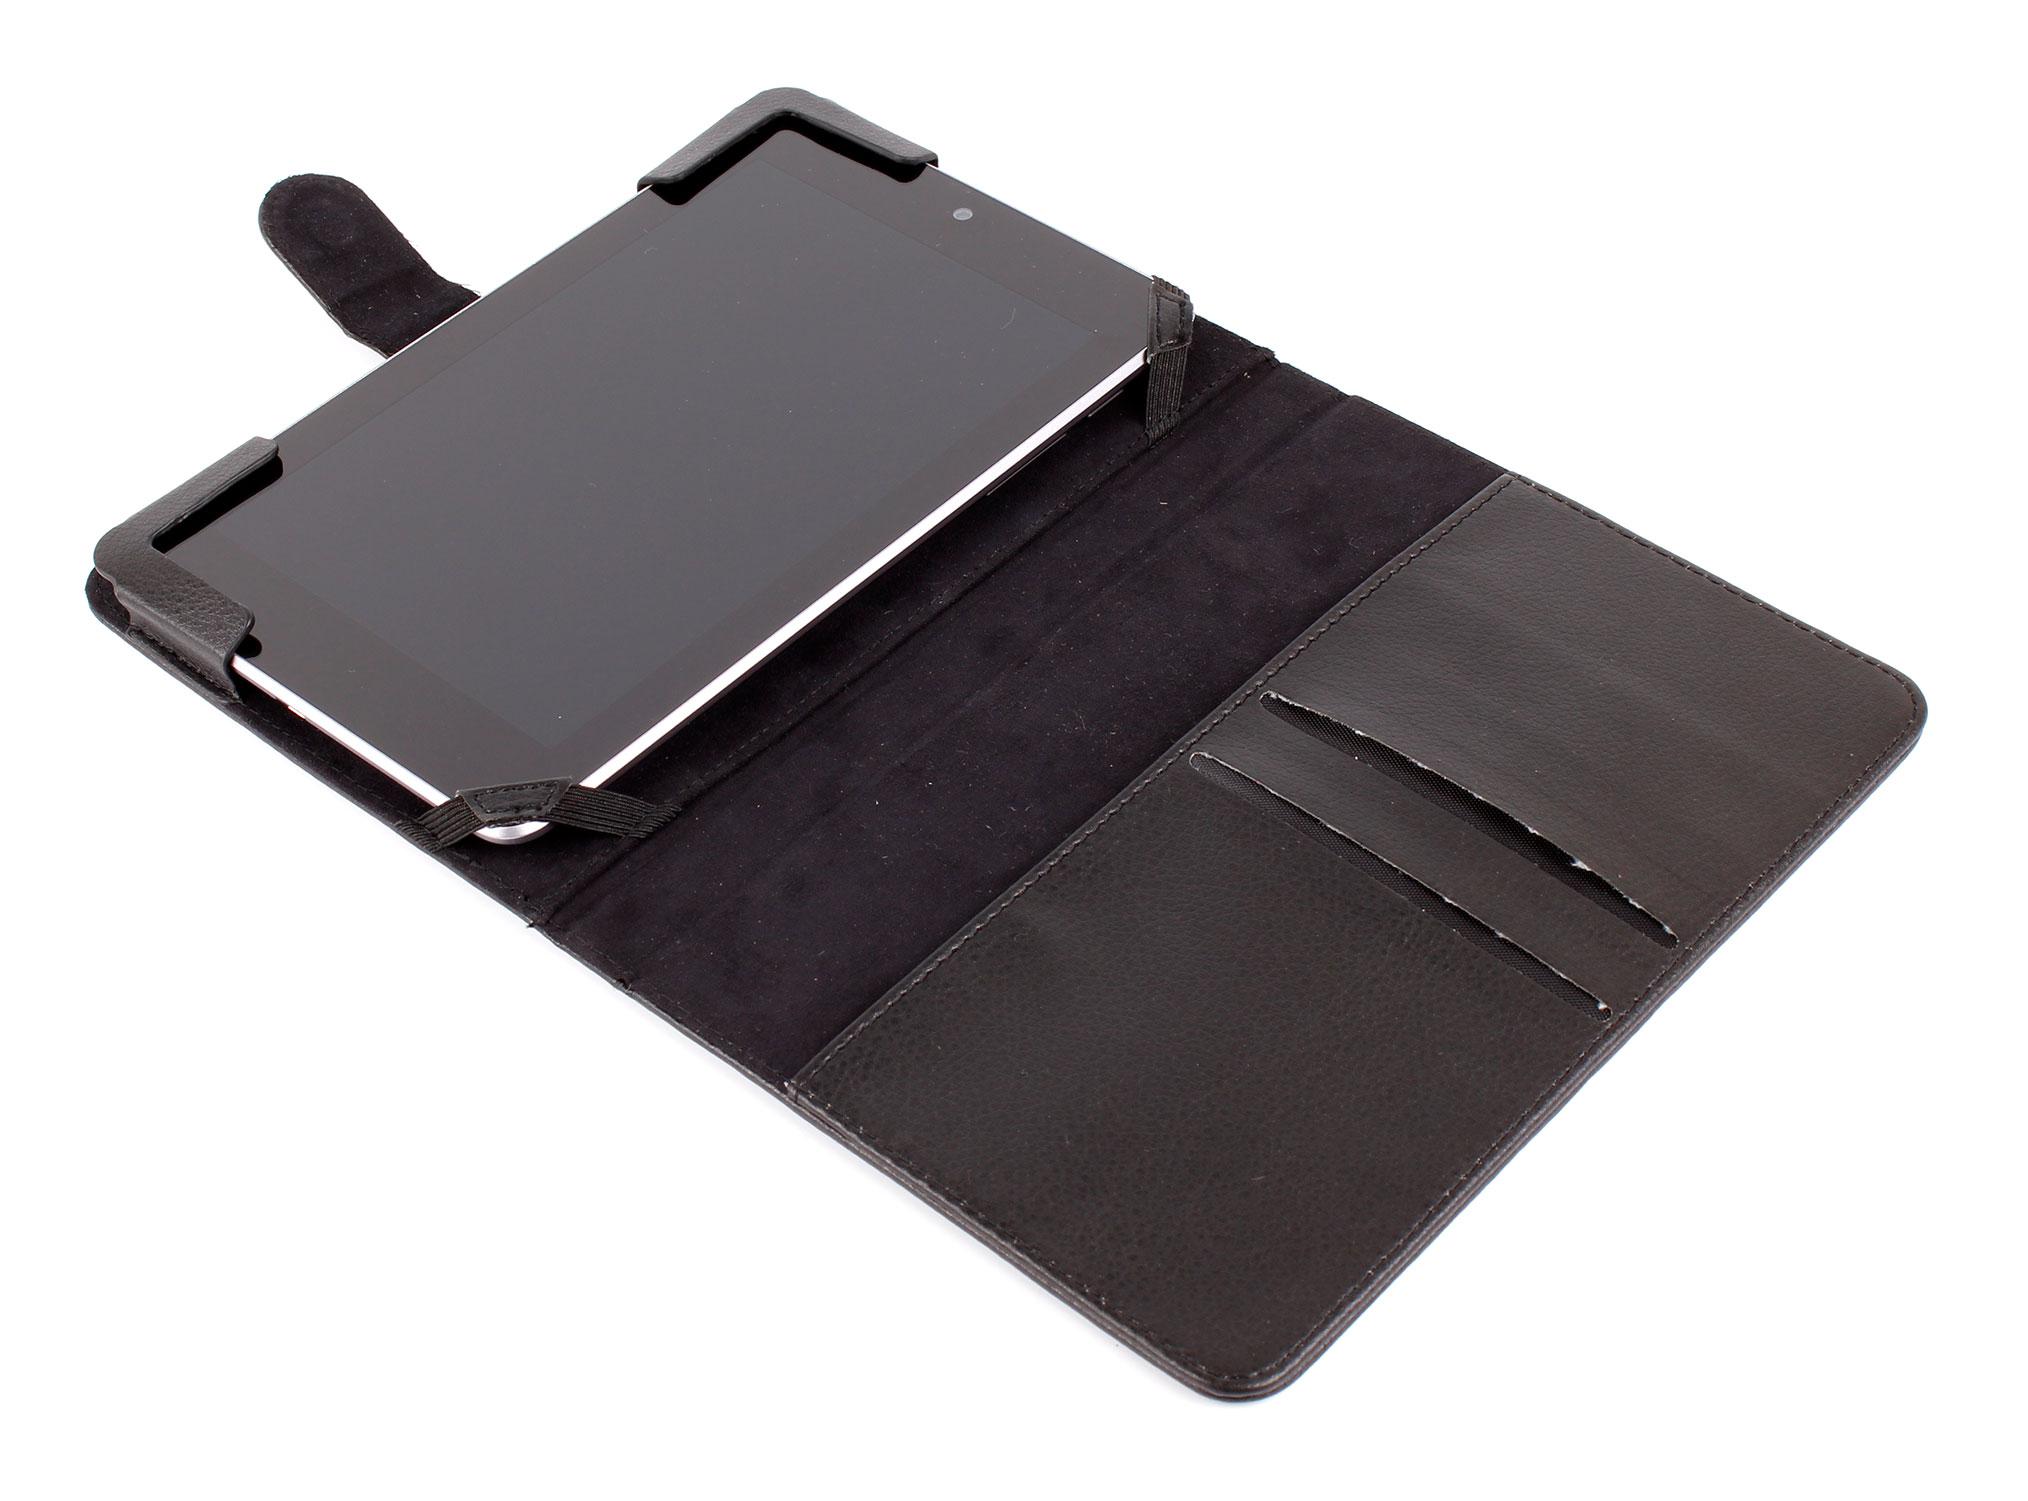 housse tablette pouces. Black Bedroom Furniture Sets. Home Design Ideas